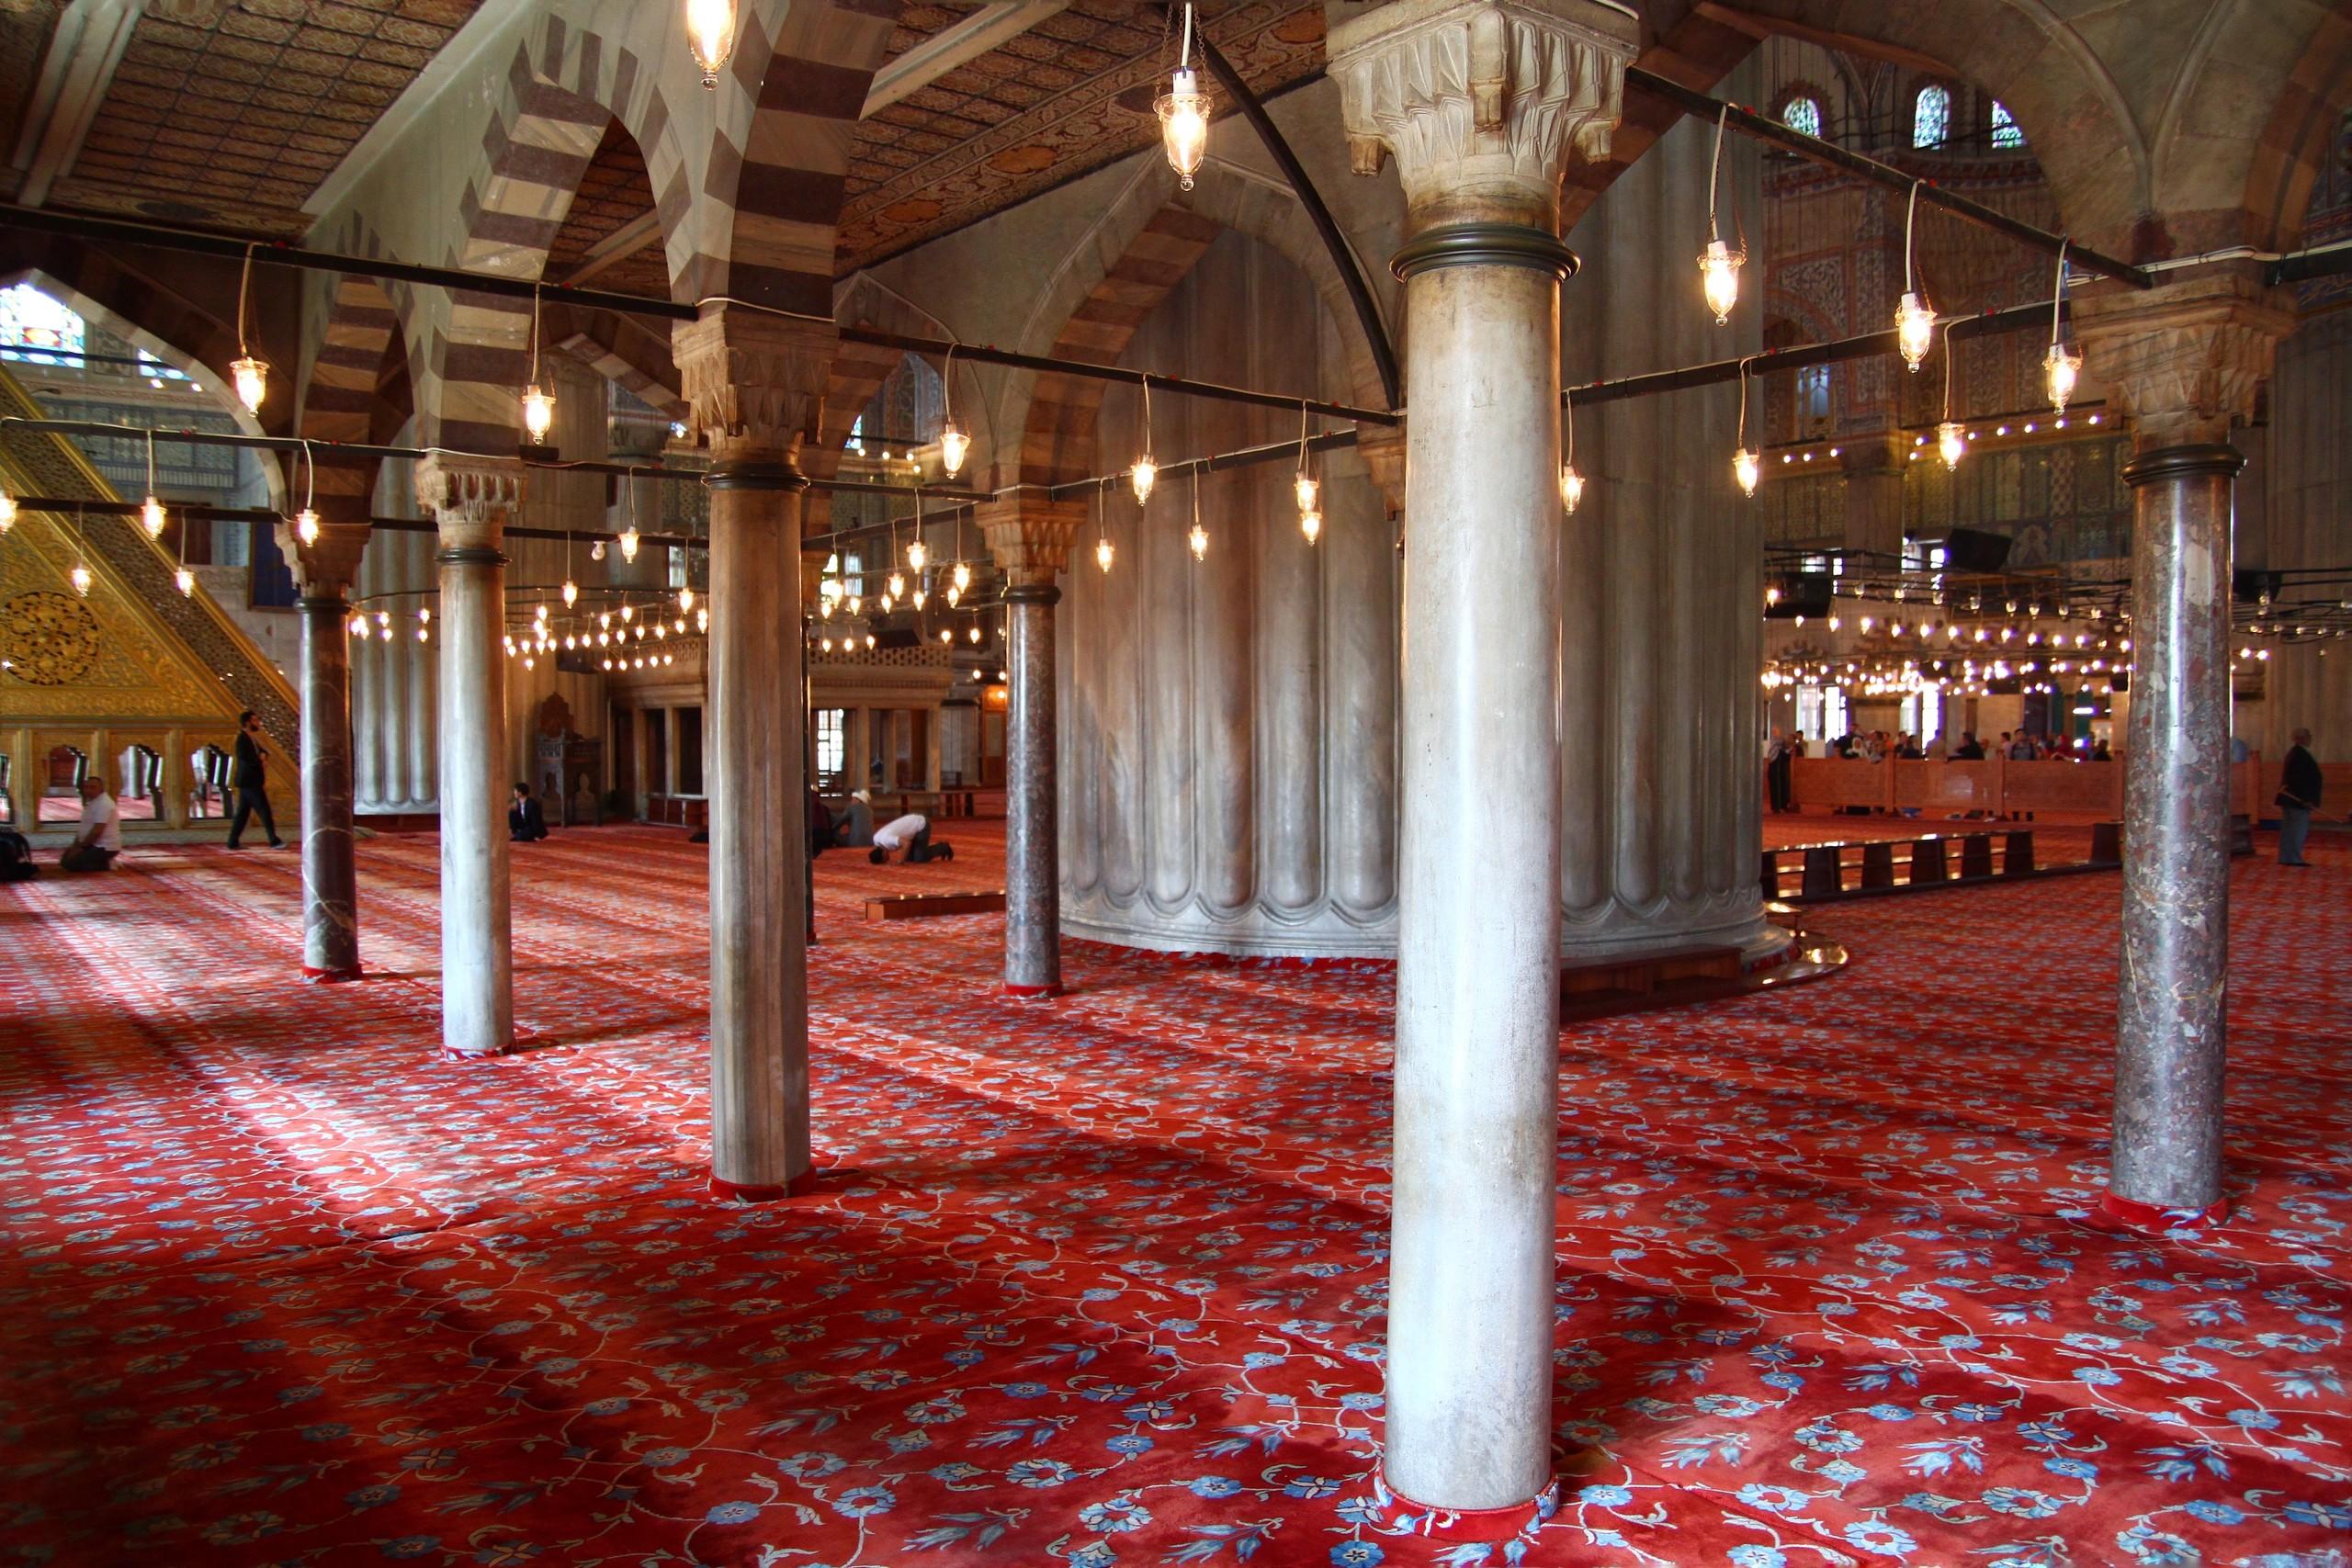 Pırlantadan Kubbeler #5: Sultanahmed - NE80gP - Pırlantadan Kubbeler #5: Sultanahmed